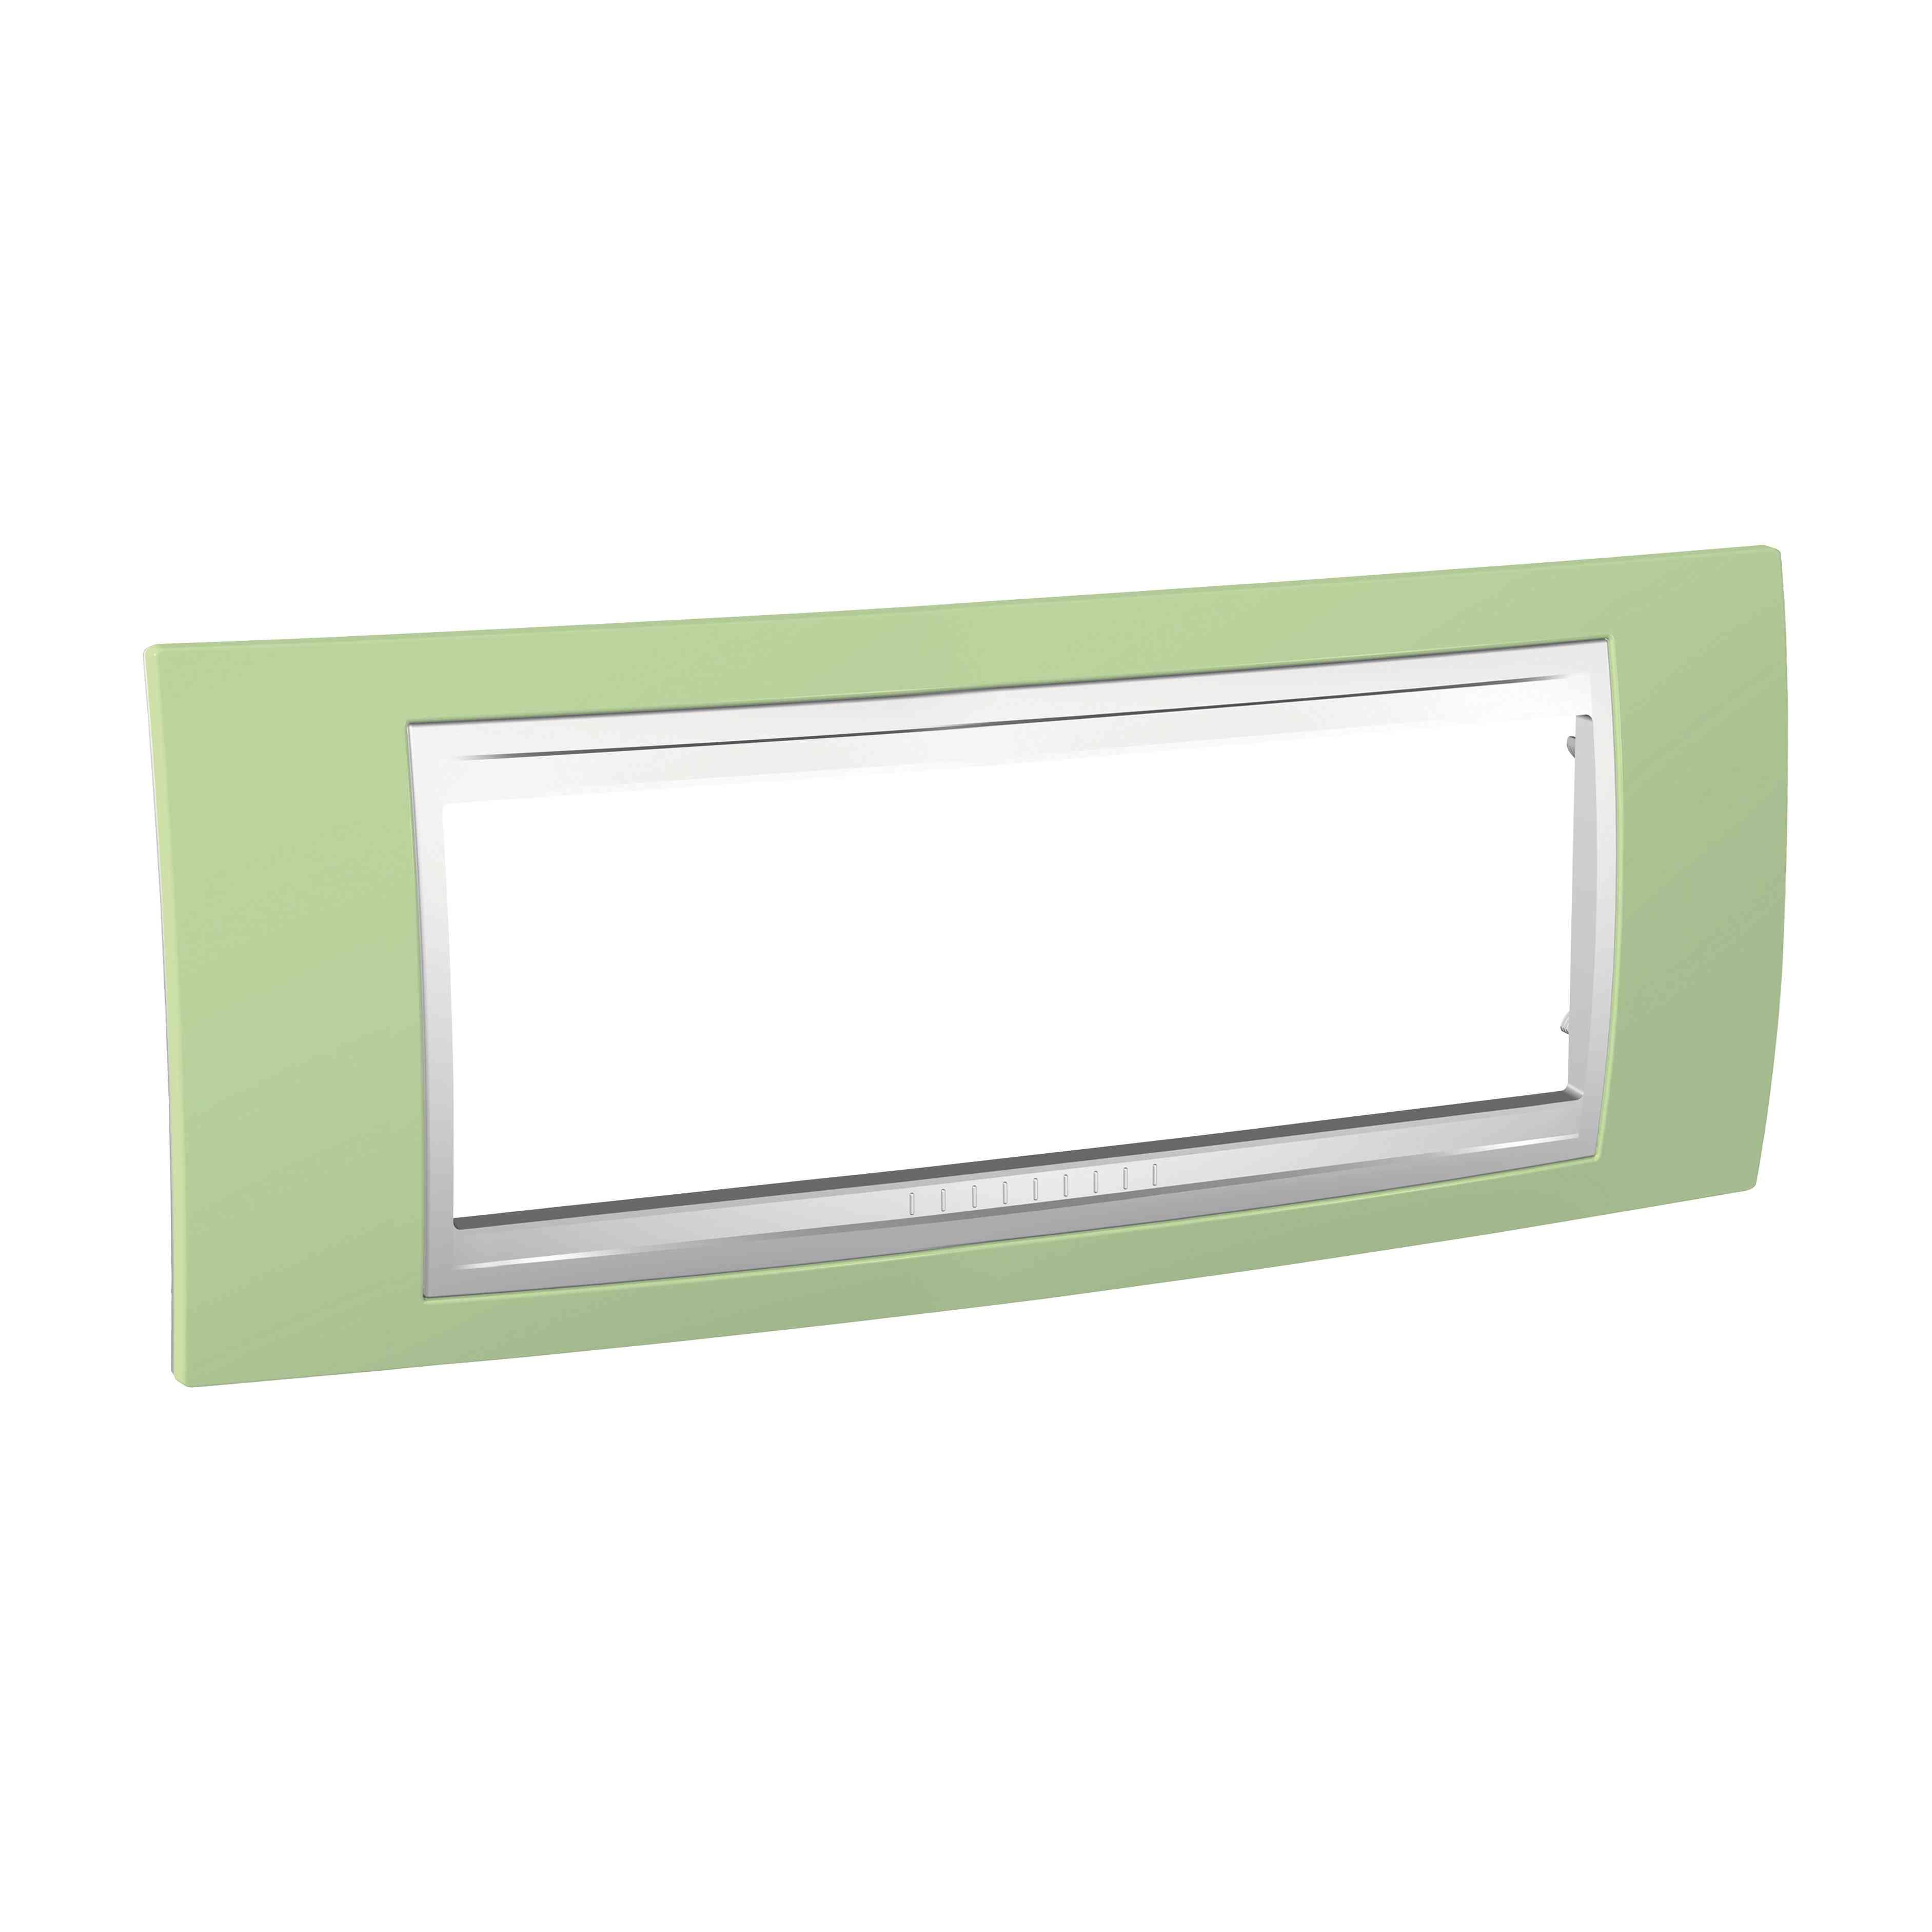 Unica - dekorativni okvir - 6 modulov - zelen/bel